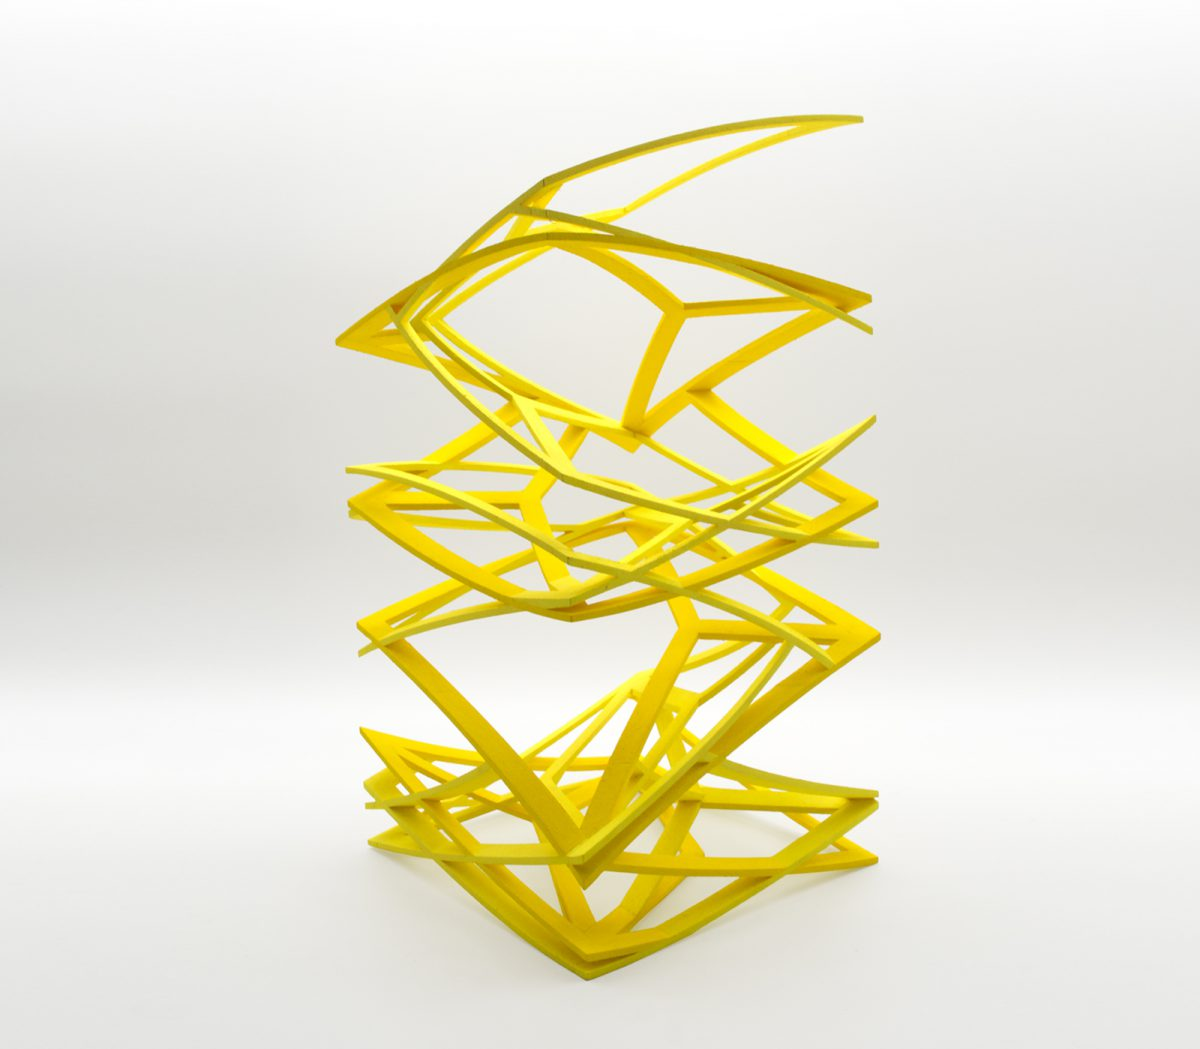 Atelier_Aescht_Cube_Formation_01_02_Installation_1600_1060